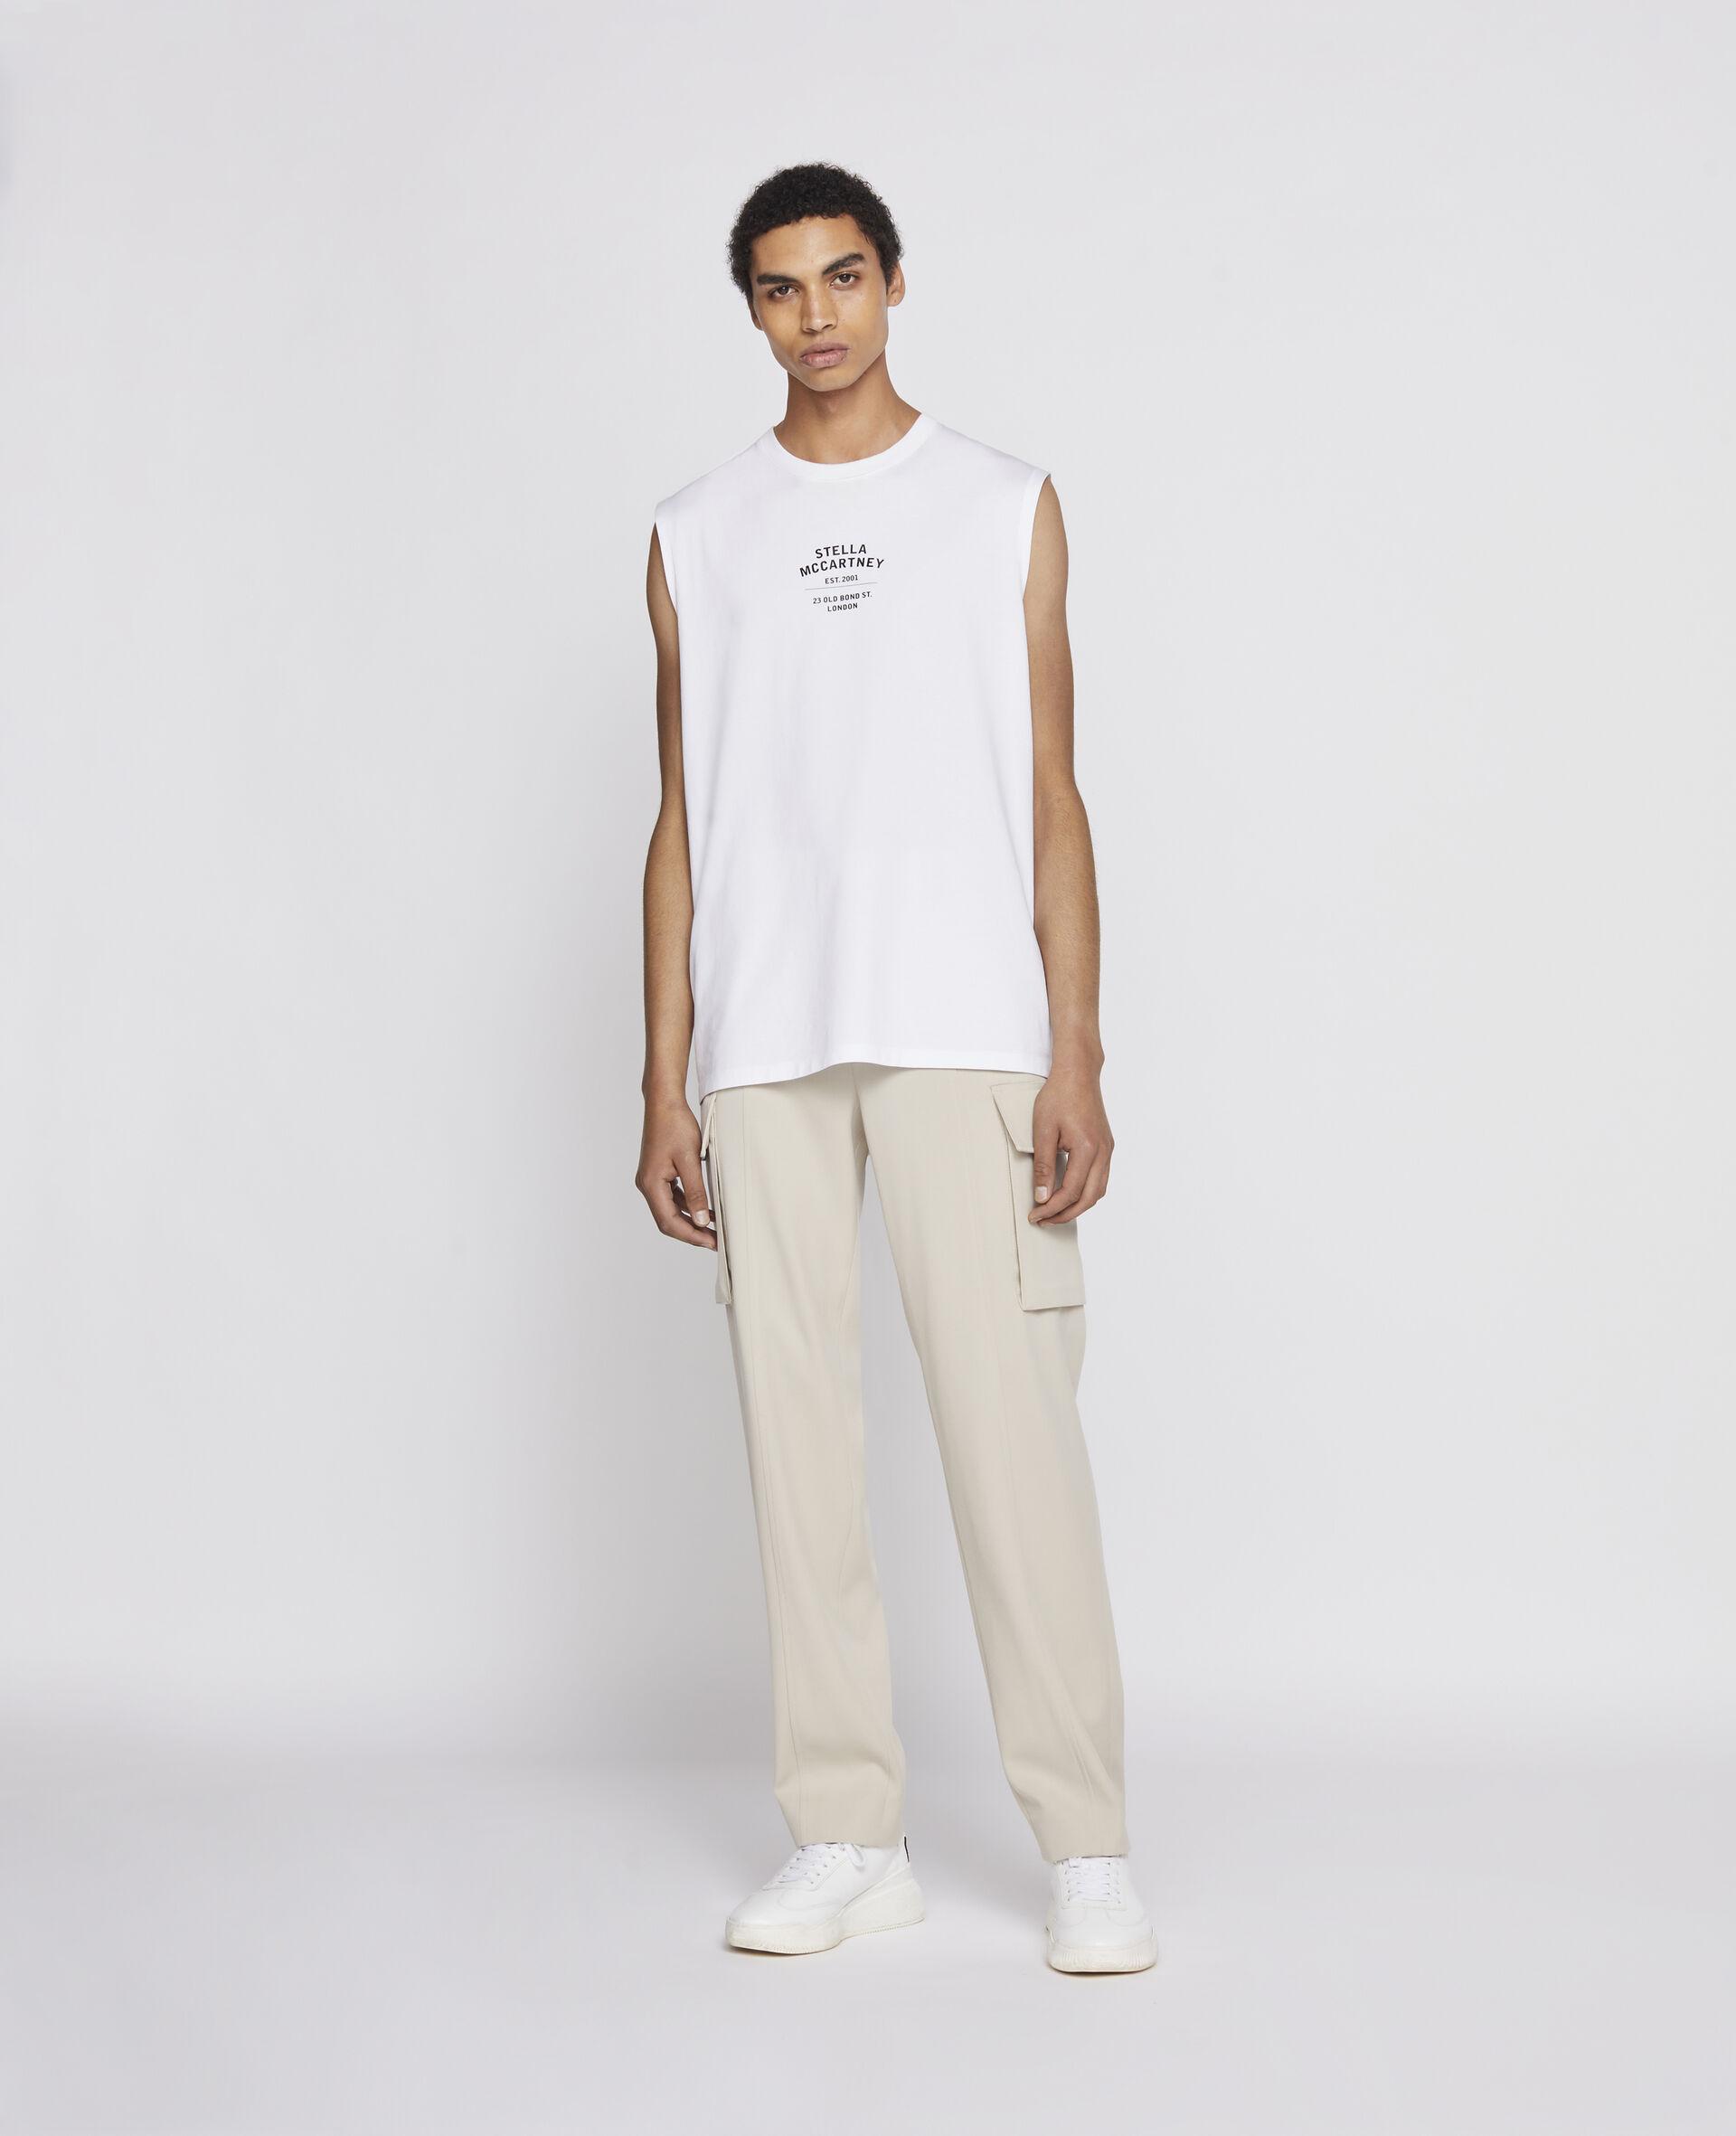 23 OBS ノースリーブ Tシャツ-ブラック-large image number 3